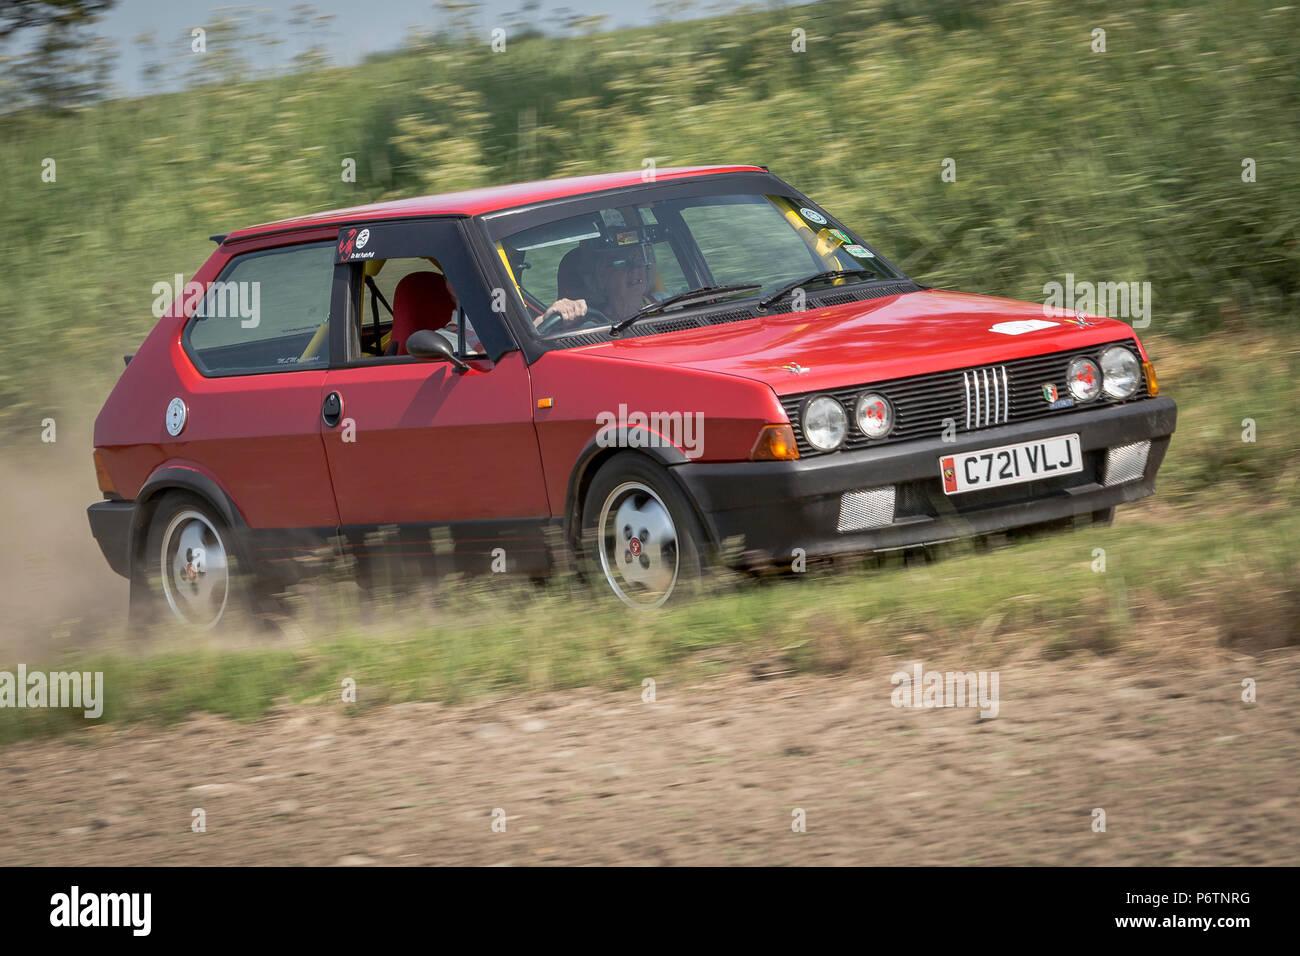 Fiat Strada running in a targa rally, UK - Stock Image